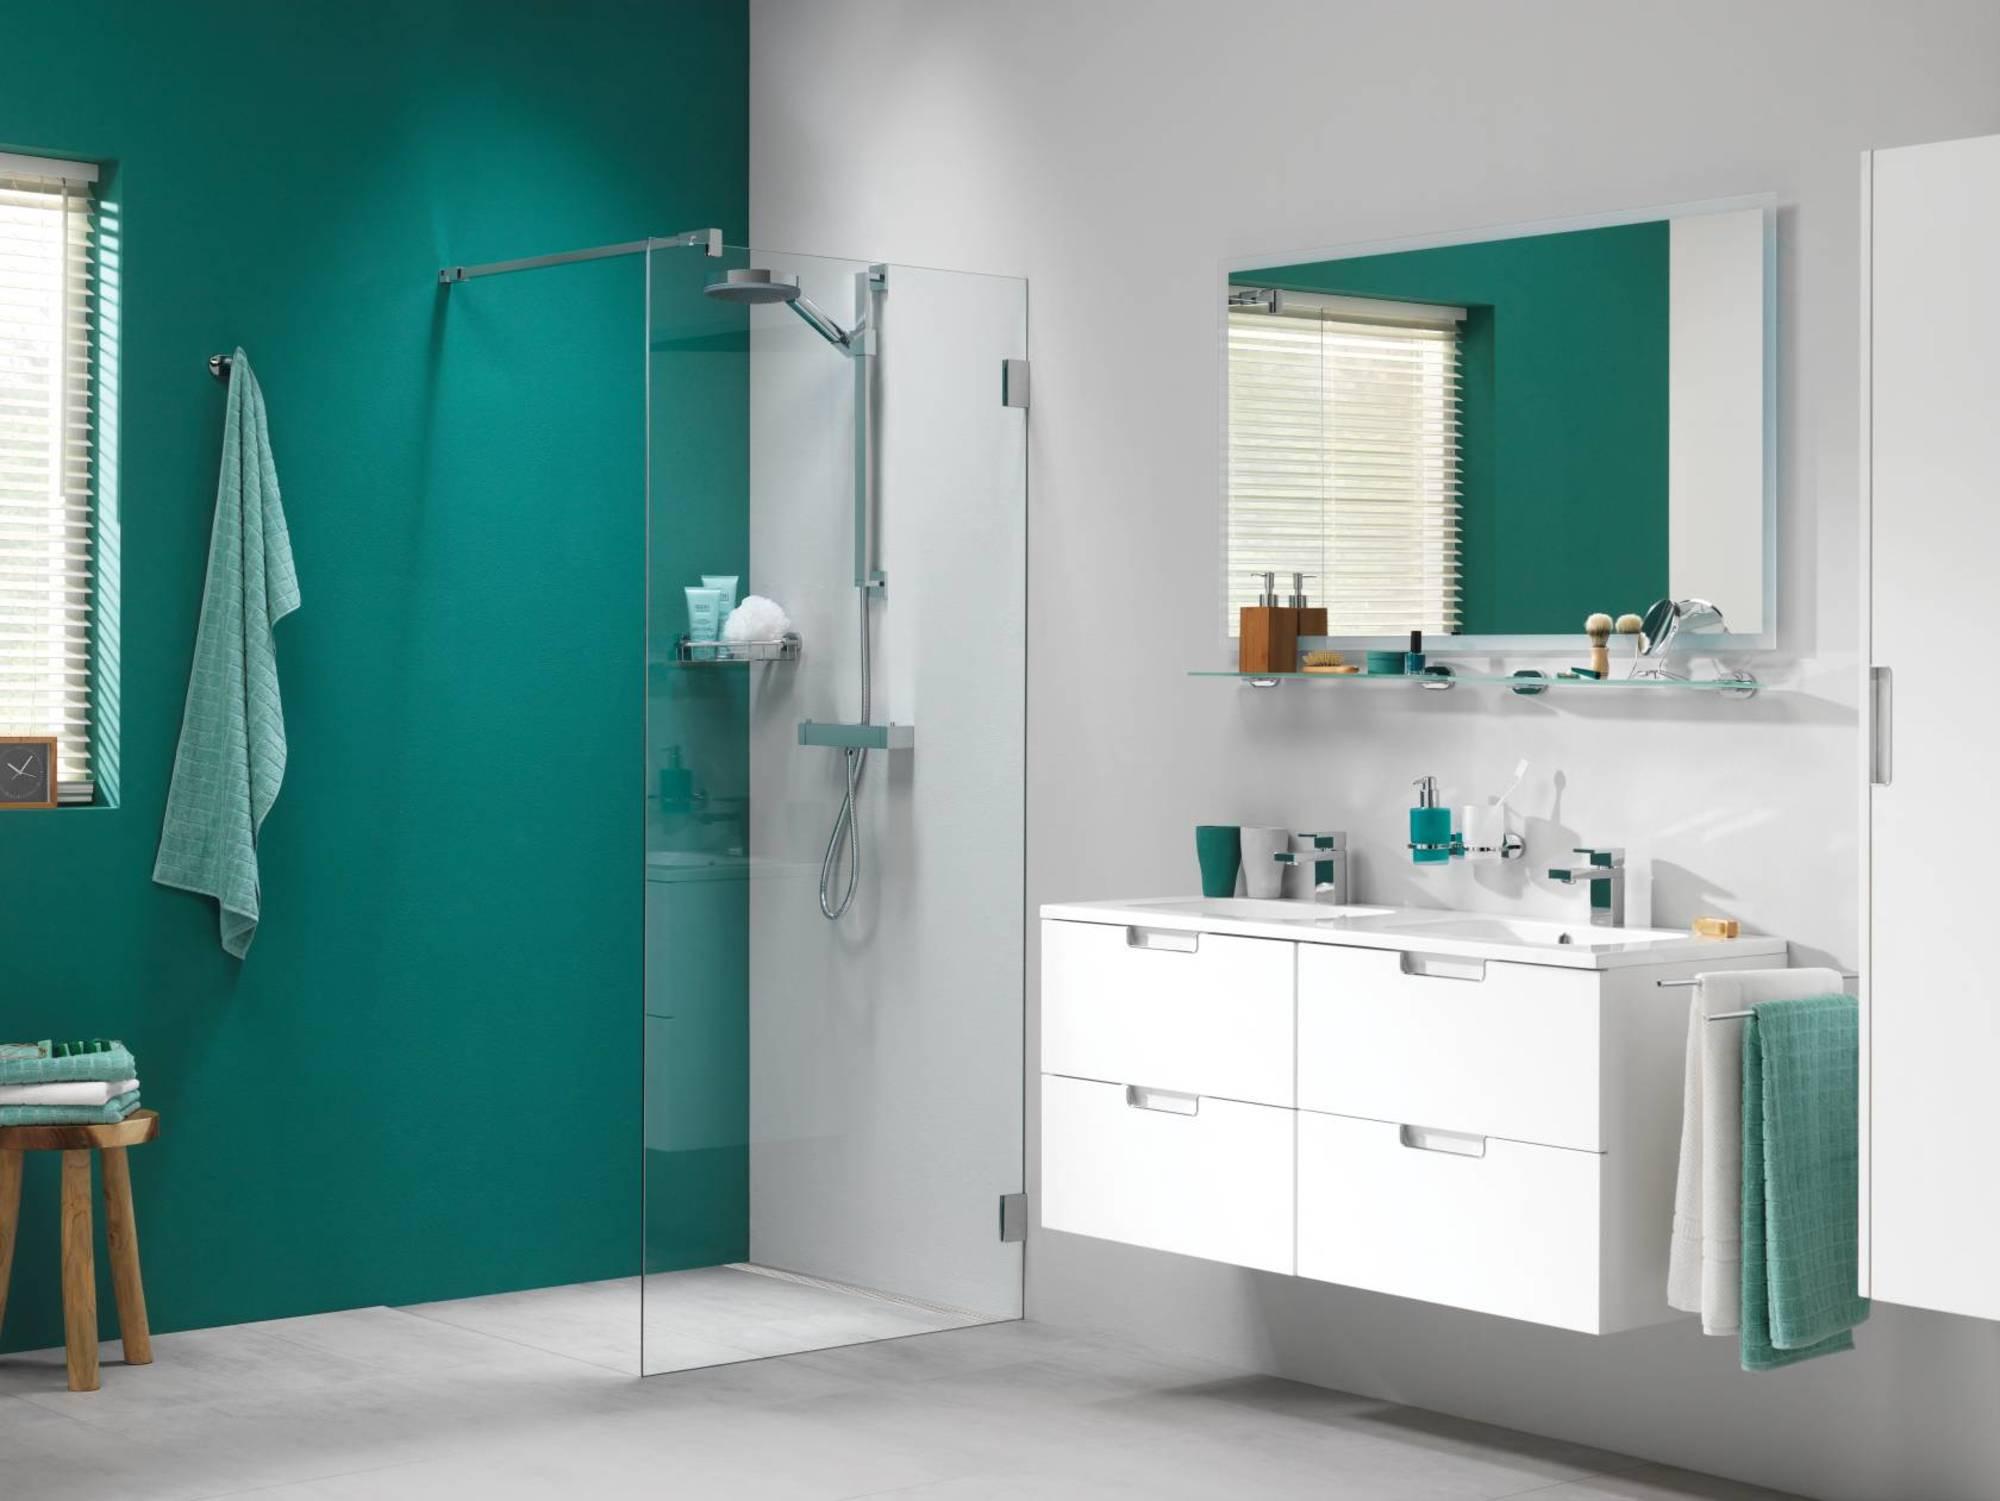 Vloerwisser Badkamer Design : Badkamer vloertrekker elegant rvs vloertrekker badkamer badkamer